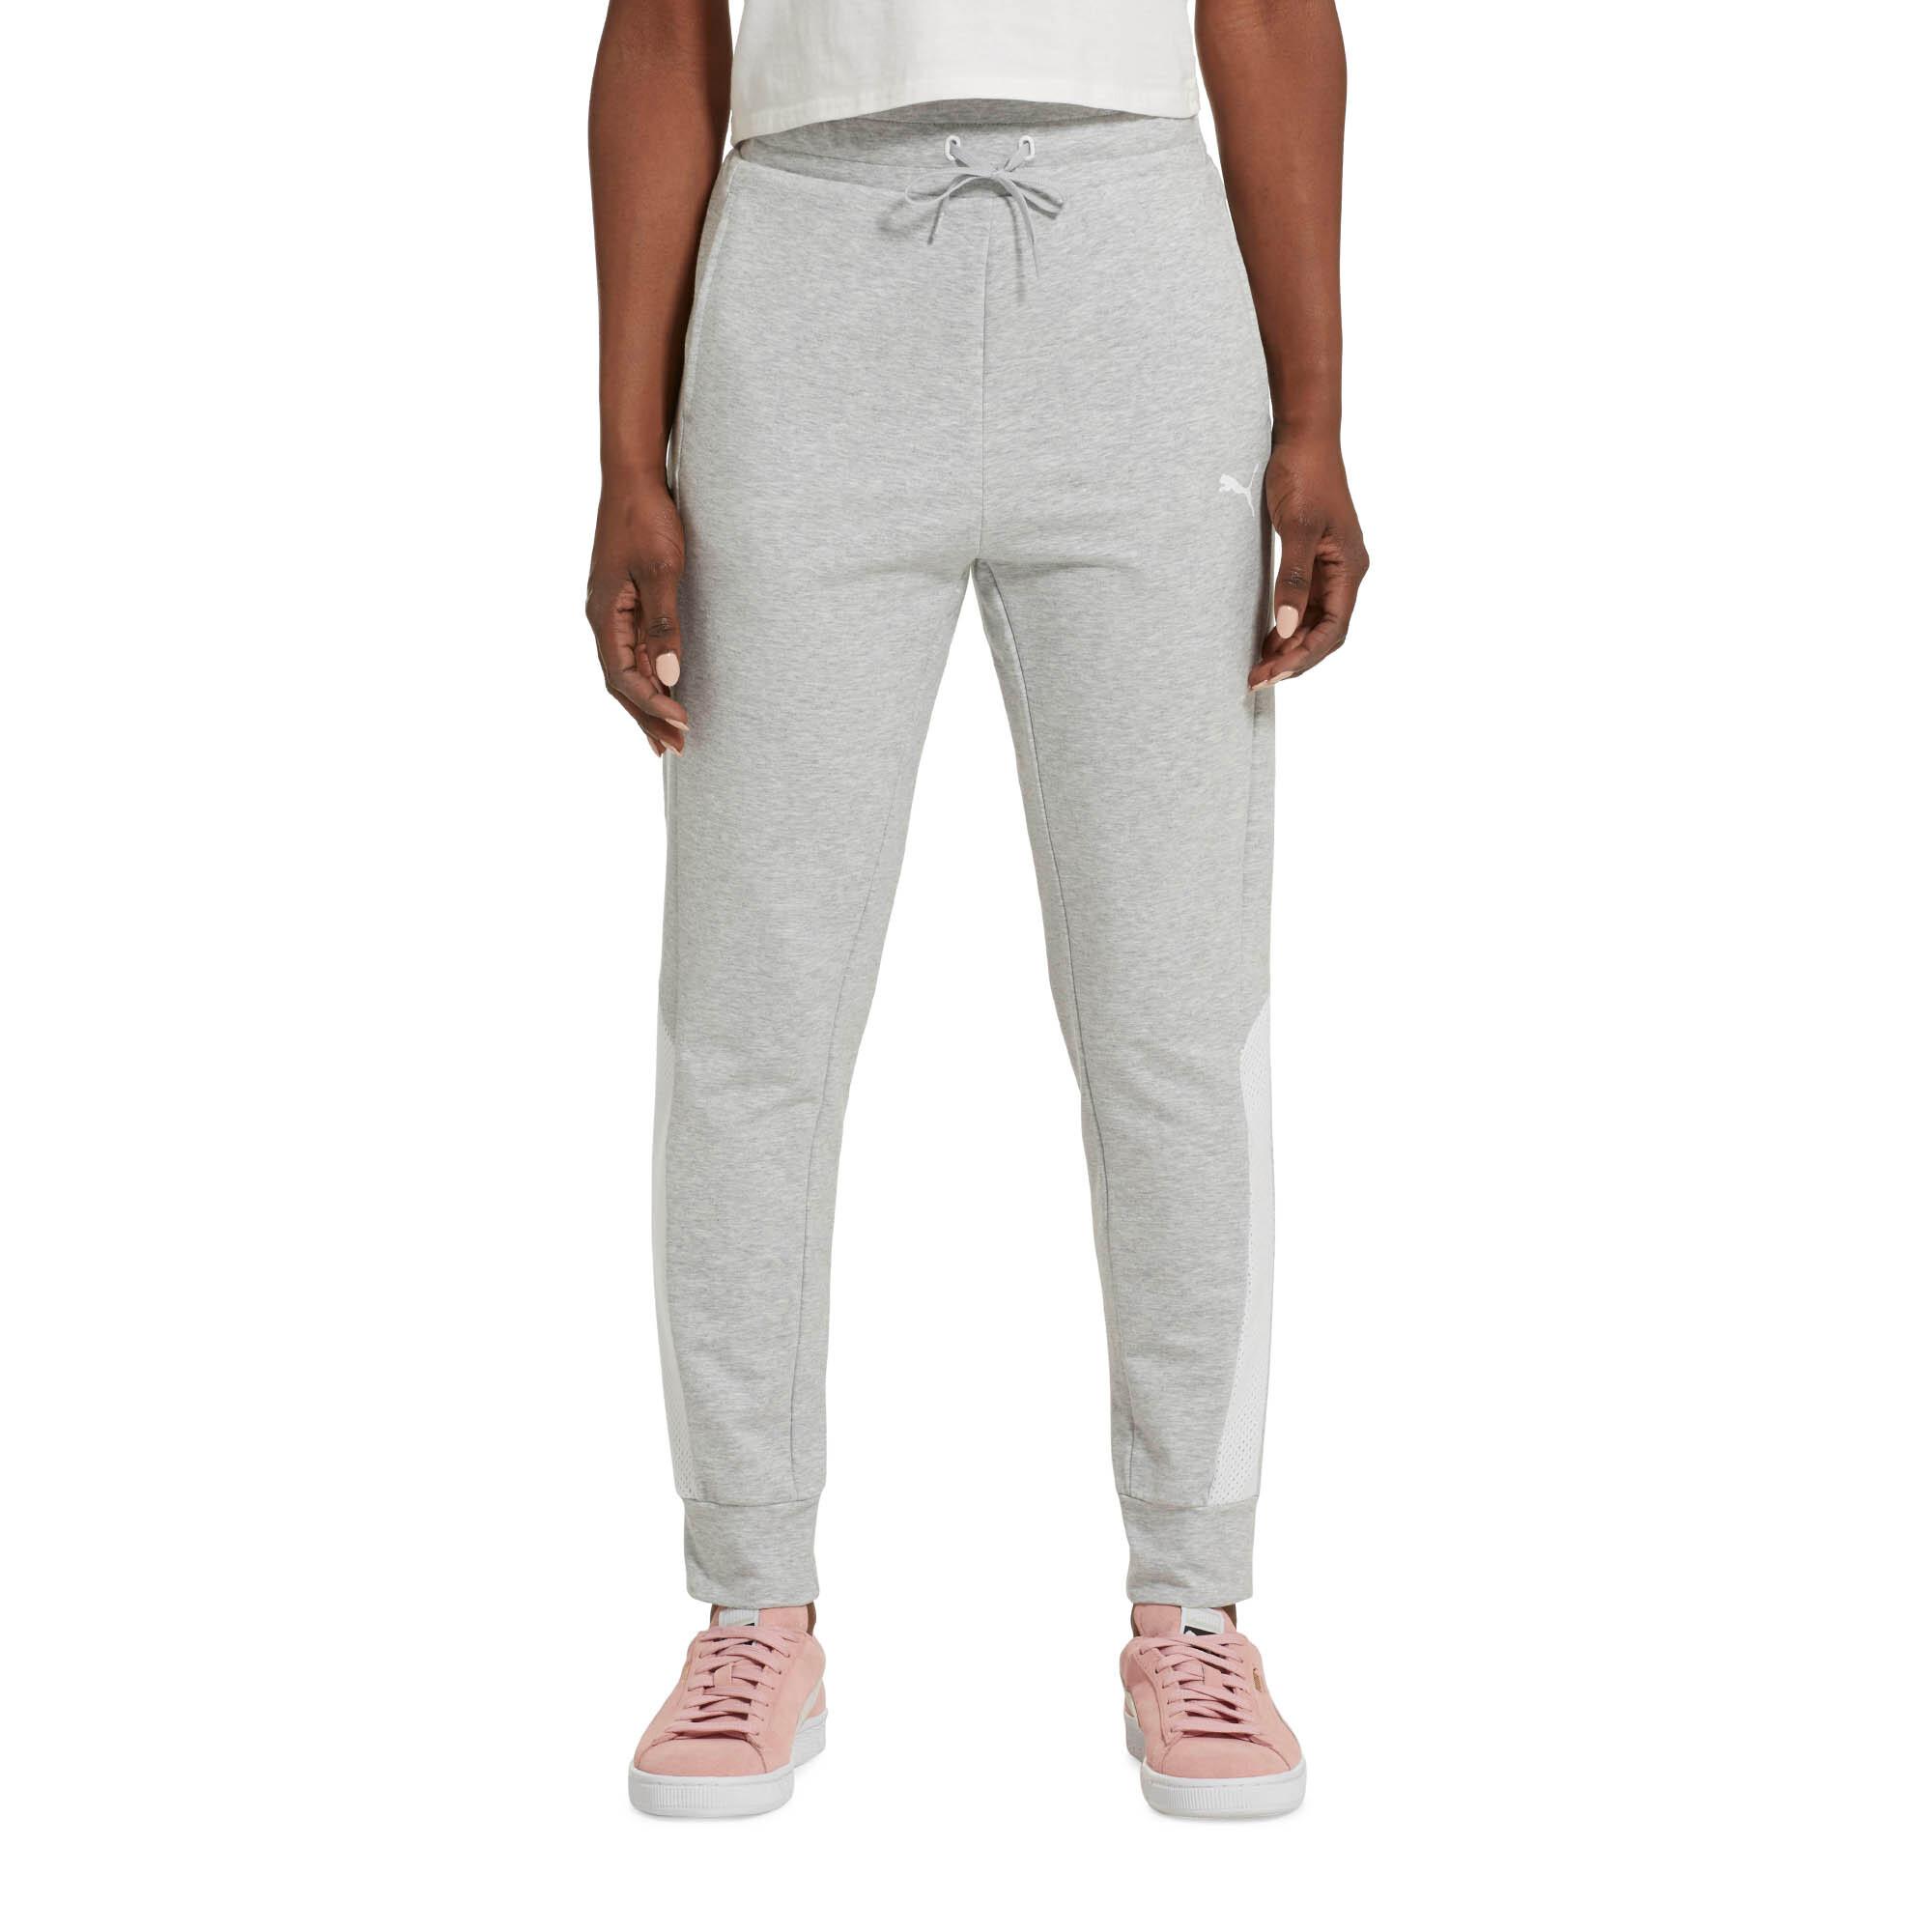 PUMA-Modern-Sports-Pants-Women-Knitted-Pants-Basics thumbnail 9